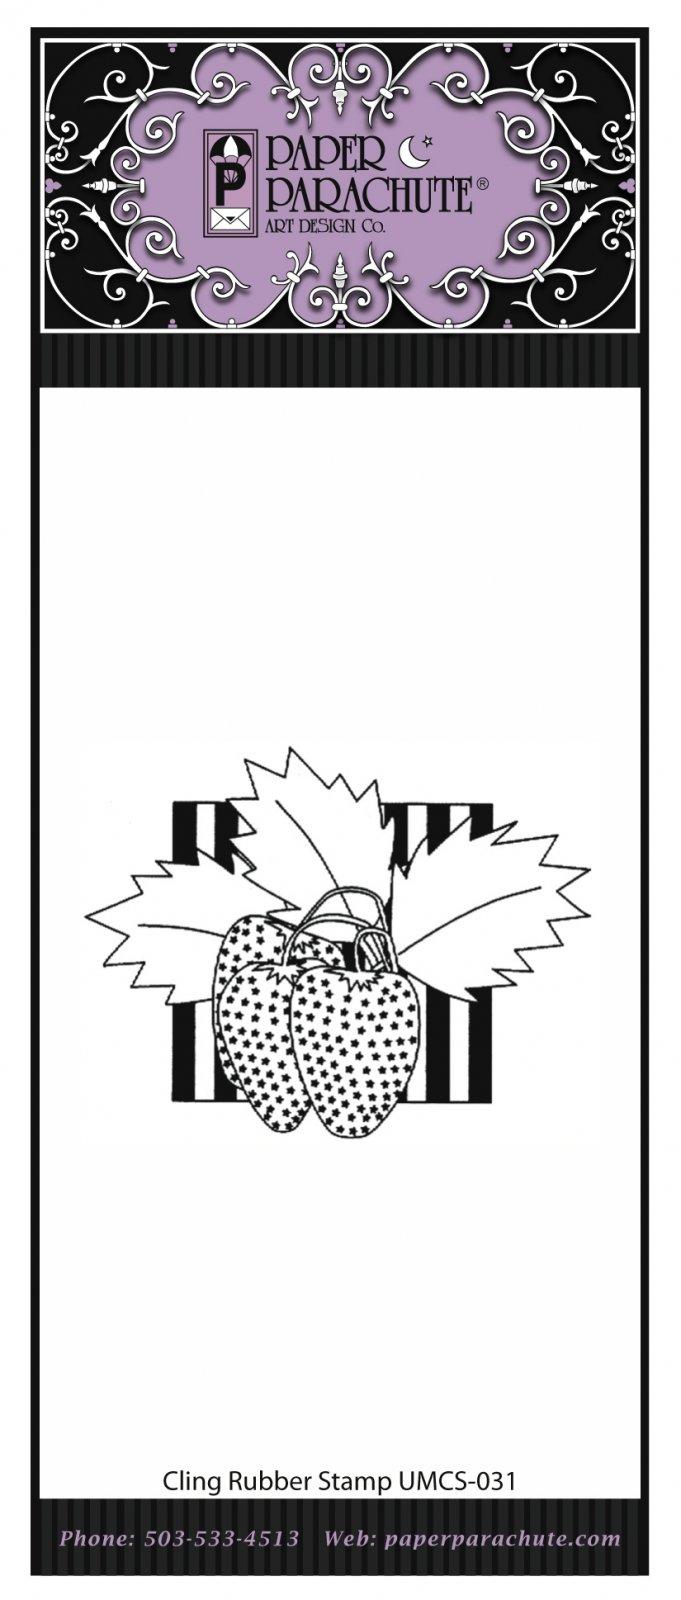 Paper Parachute Rubber Stamp - UMCS31